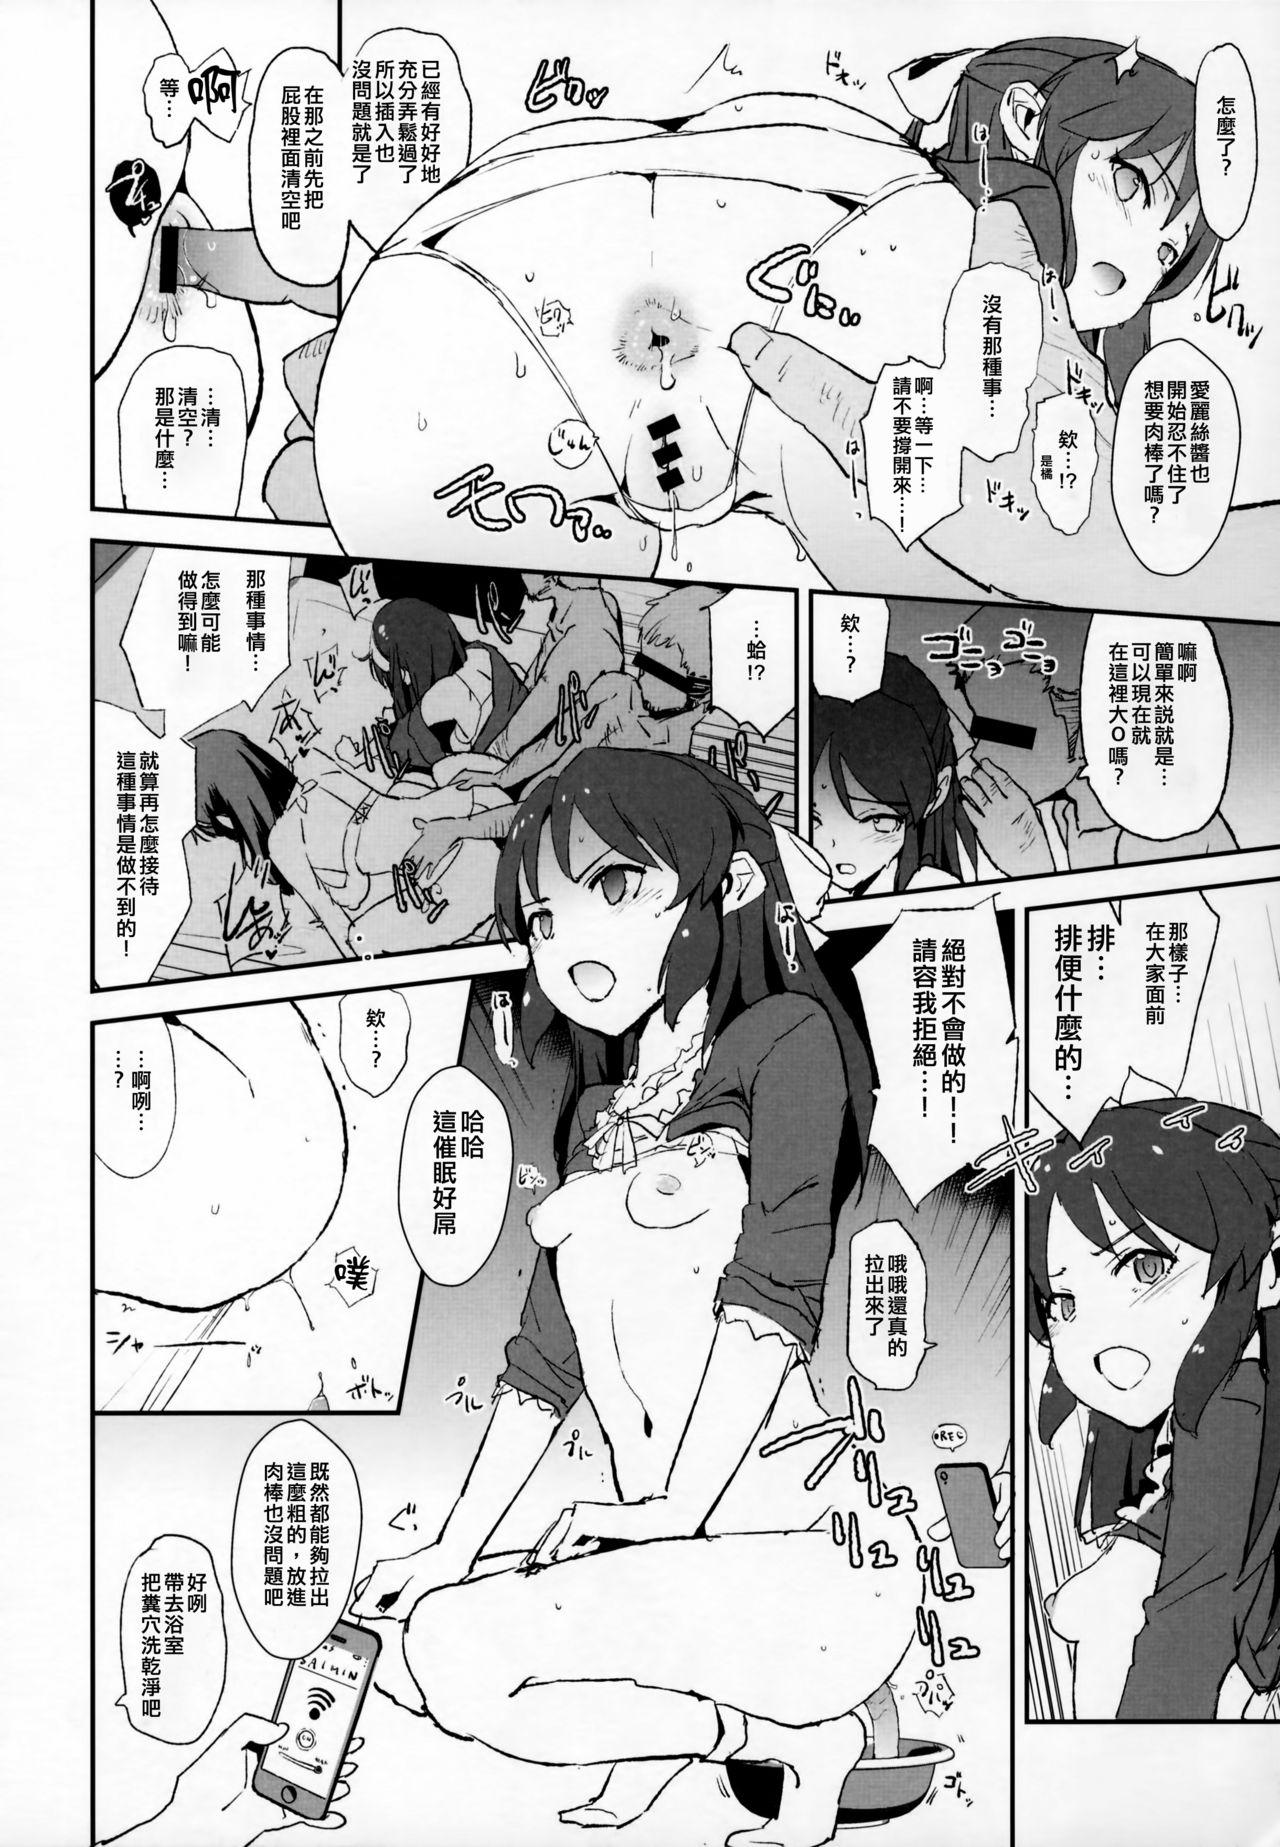 Sagisawa Fumika no Saimin Dosukebe Settai Party with Tachibana Arisu to Nitta Minami + Omake Paper 17